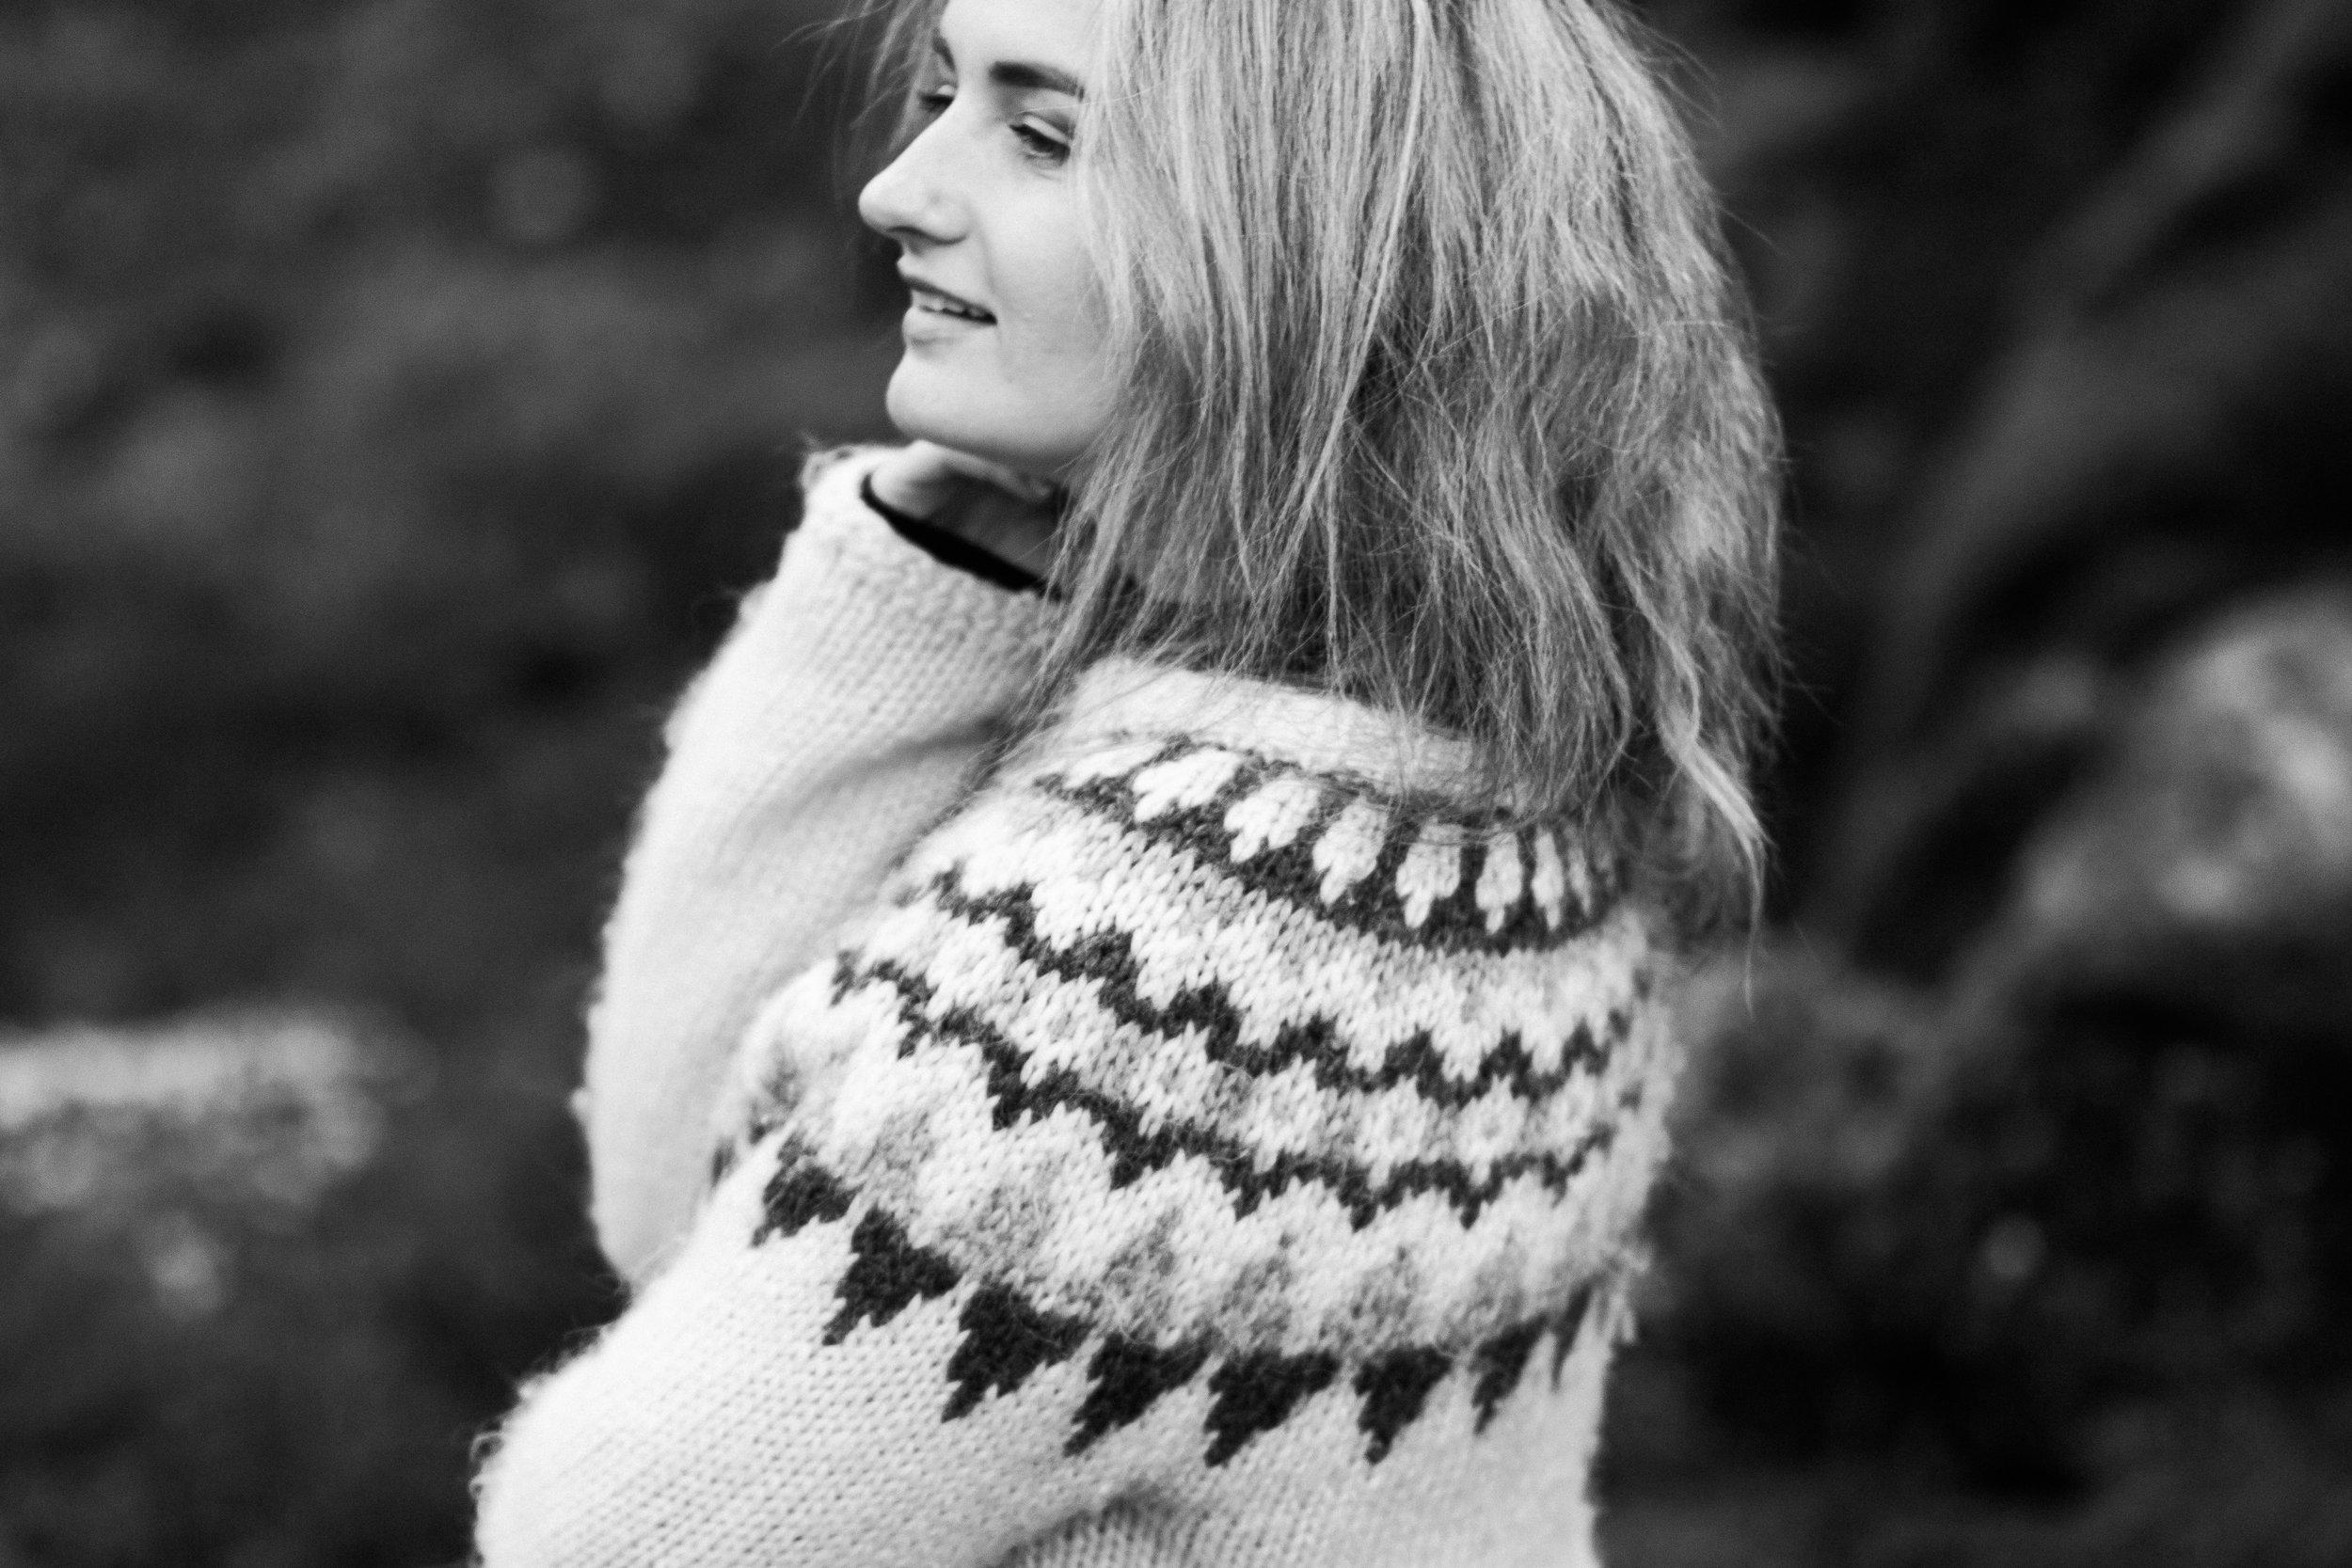 Solo traveller portrait shoot in Iceland